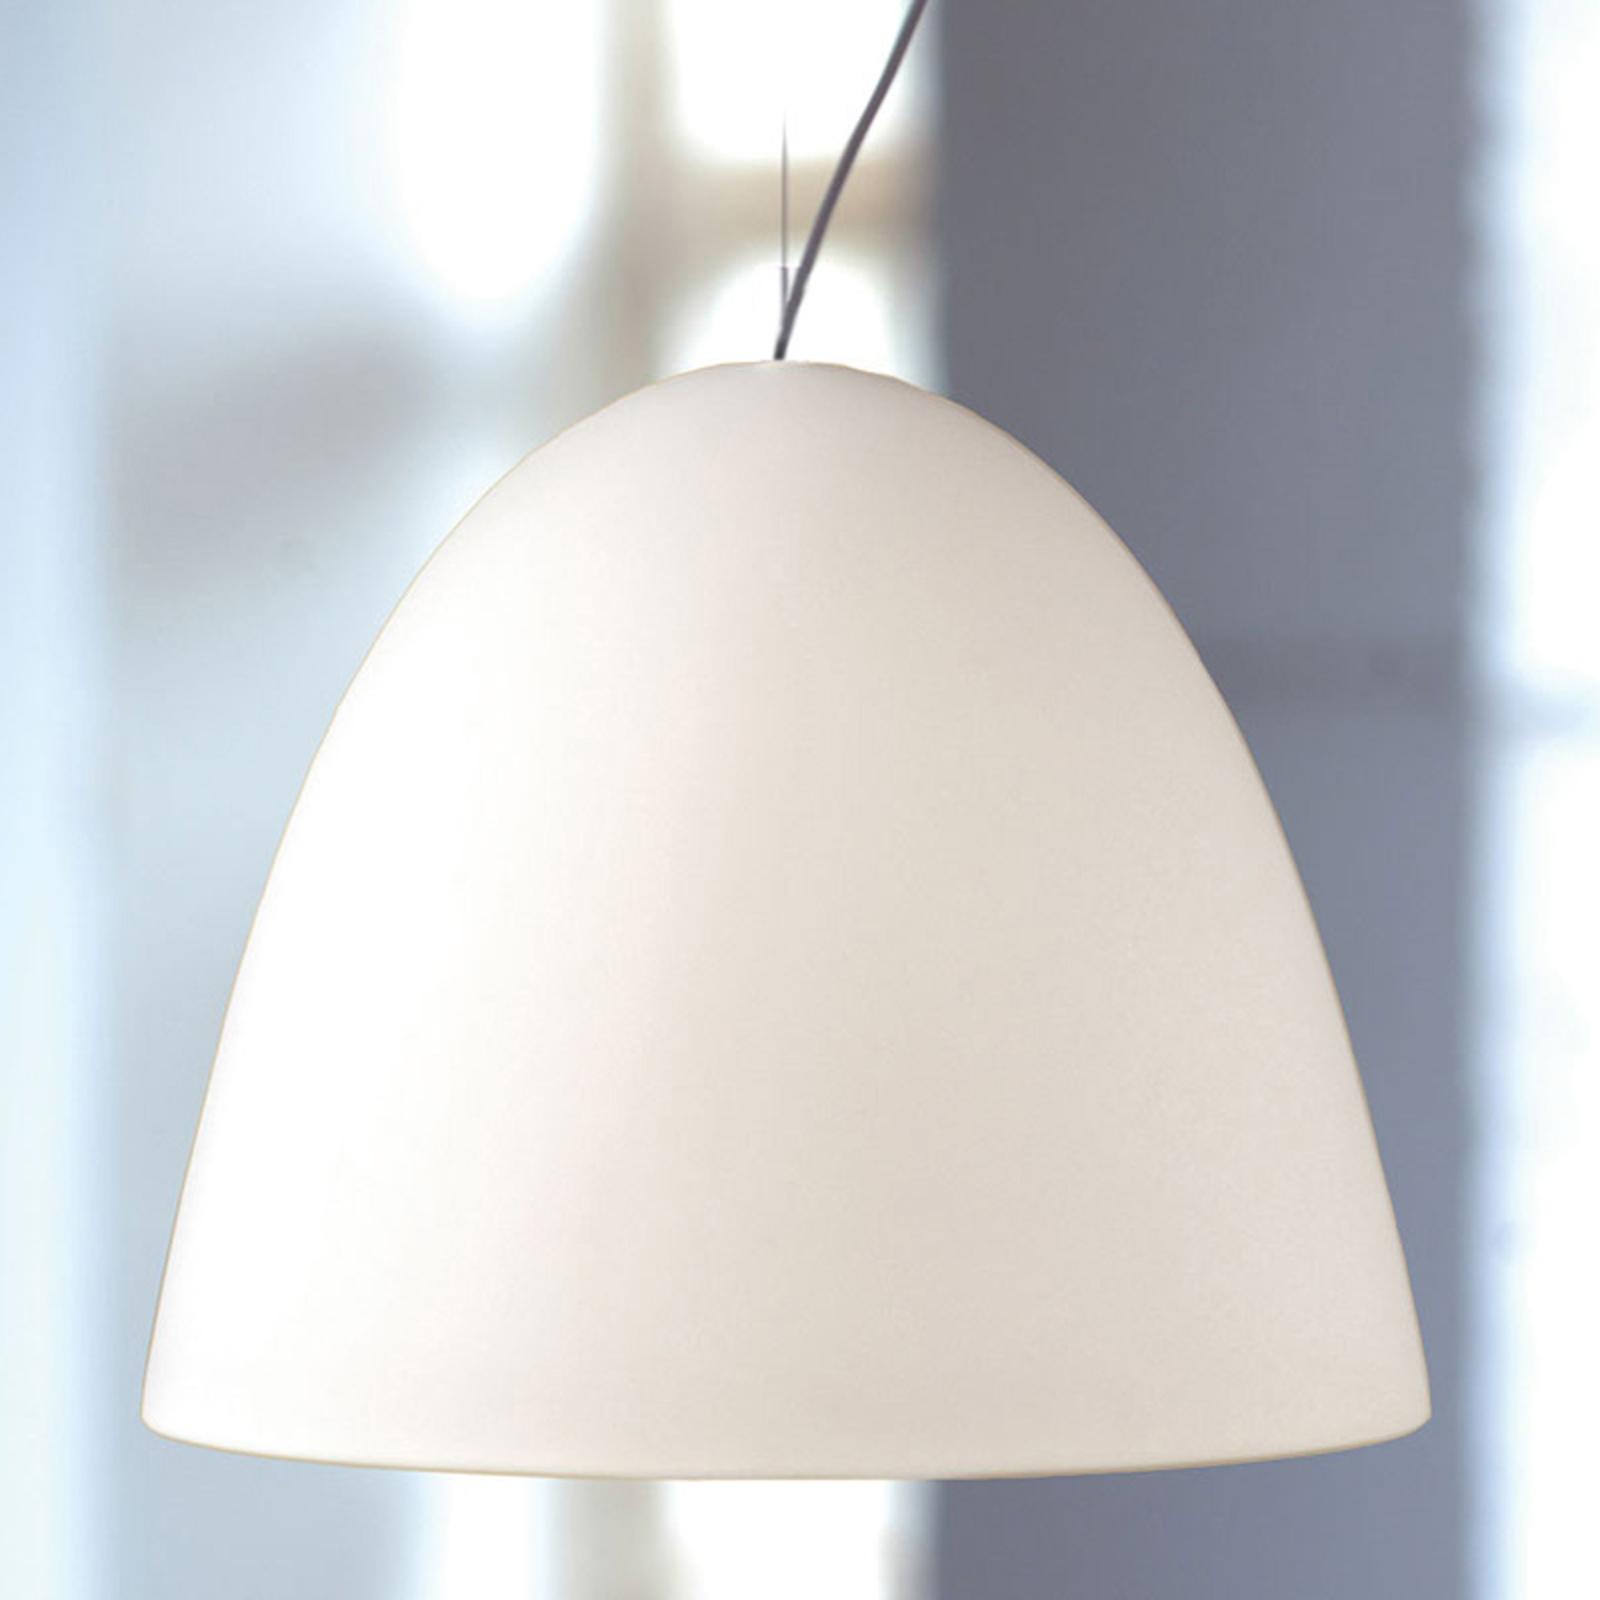 Hanglamp BELL, 30 cm, 1 -lichts